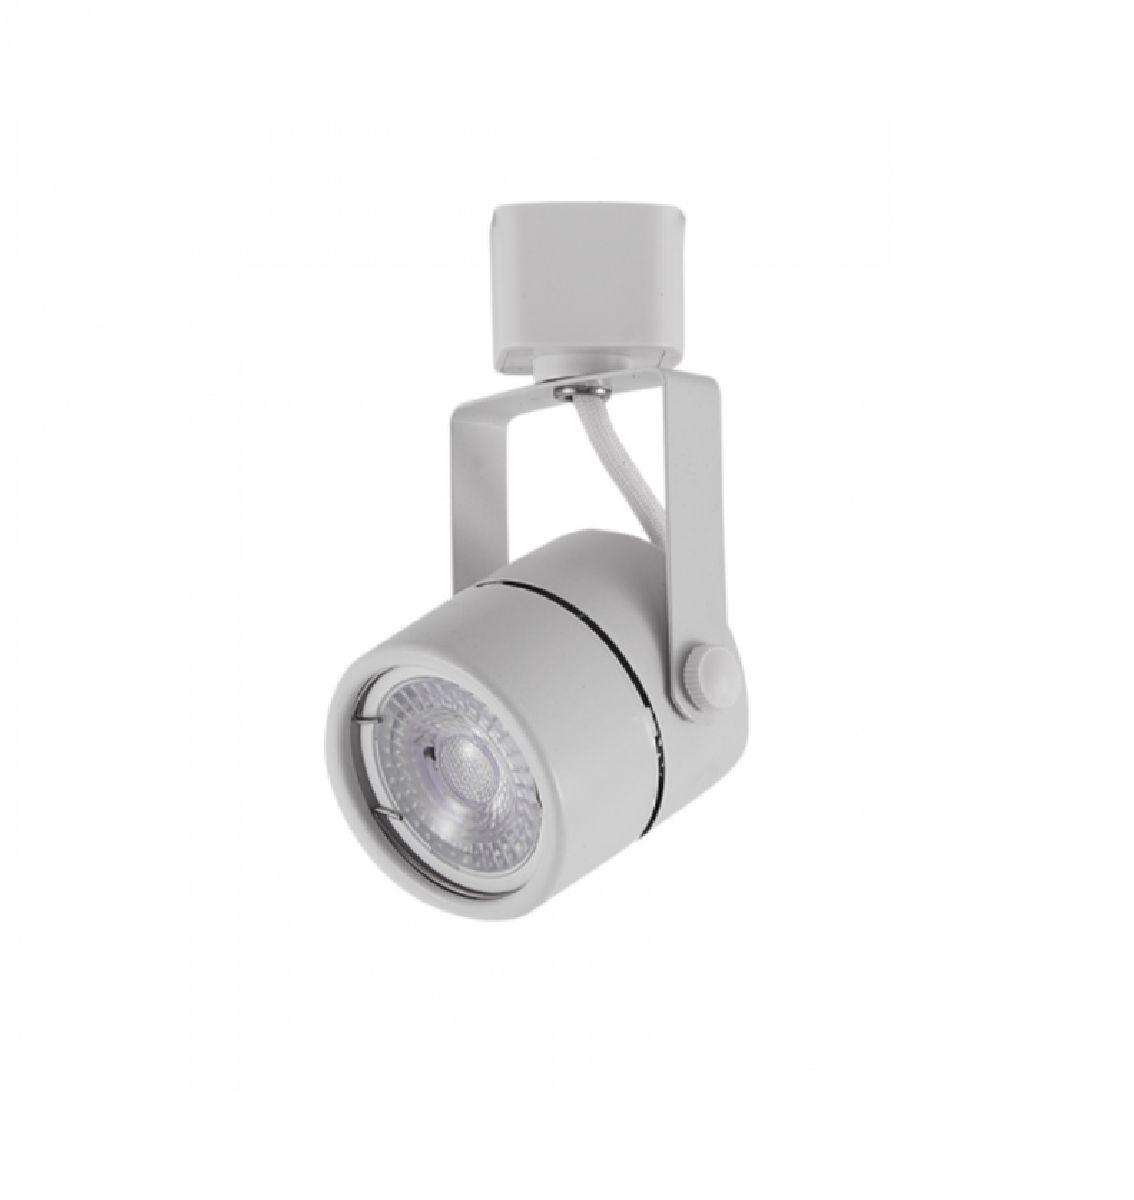 Kit Trilho Eletrificado 2m Branco Nordecor + 4 Spot Redondo MR16 / GU10 + Lâmp. Led Luz Quente